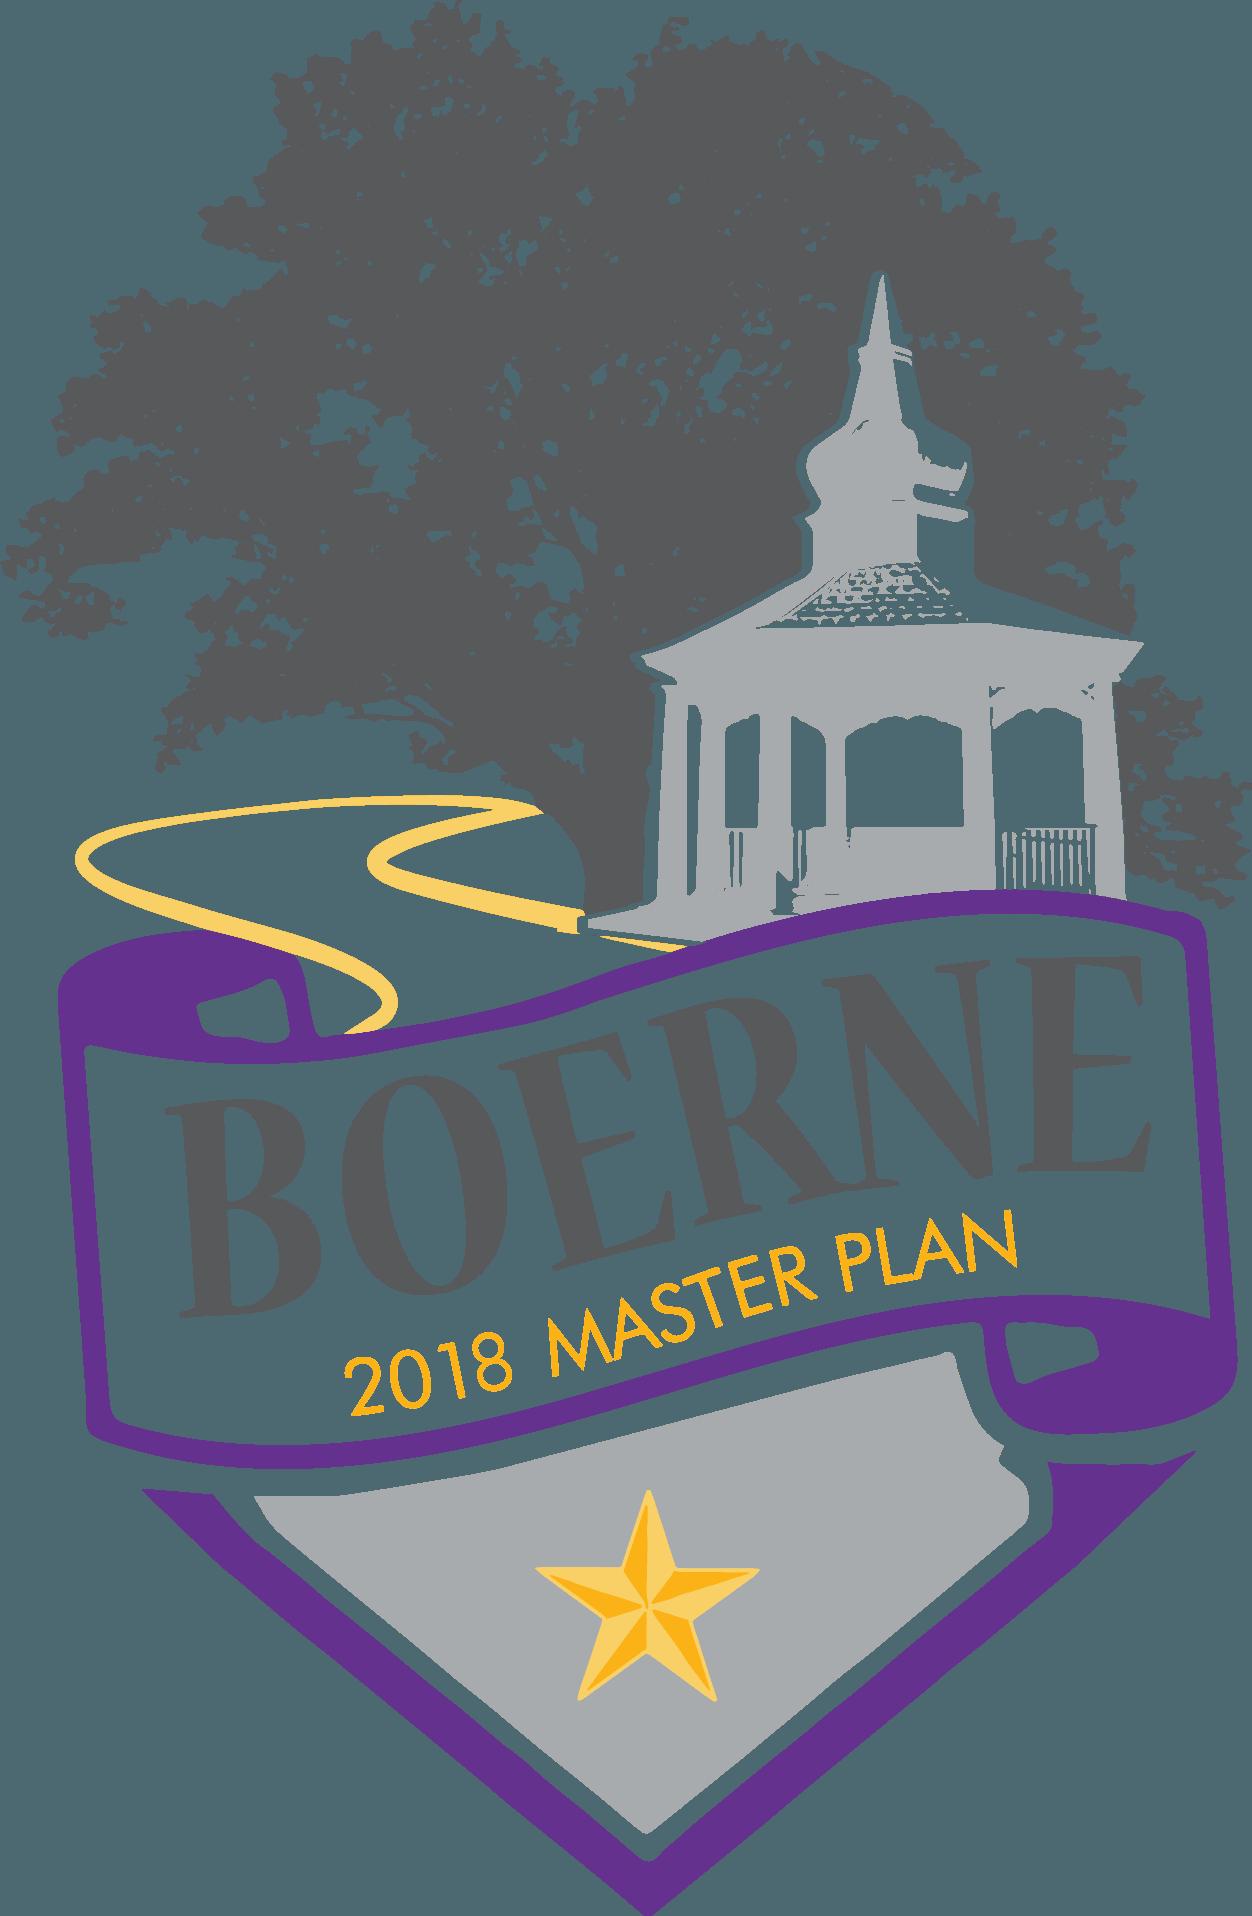 Planner clipart planning meeting. Boerne master plan update